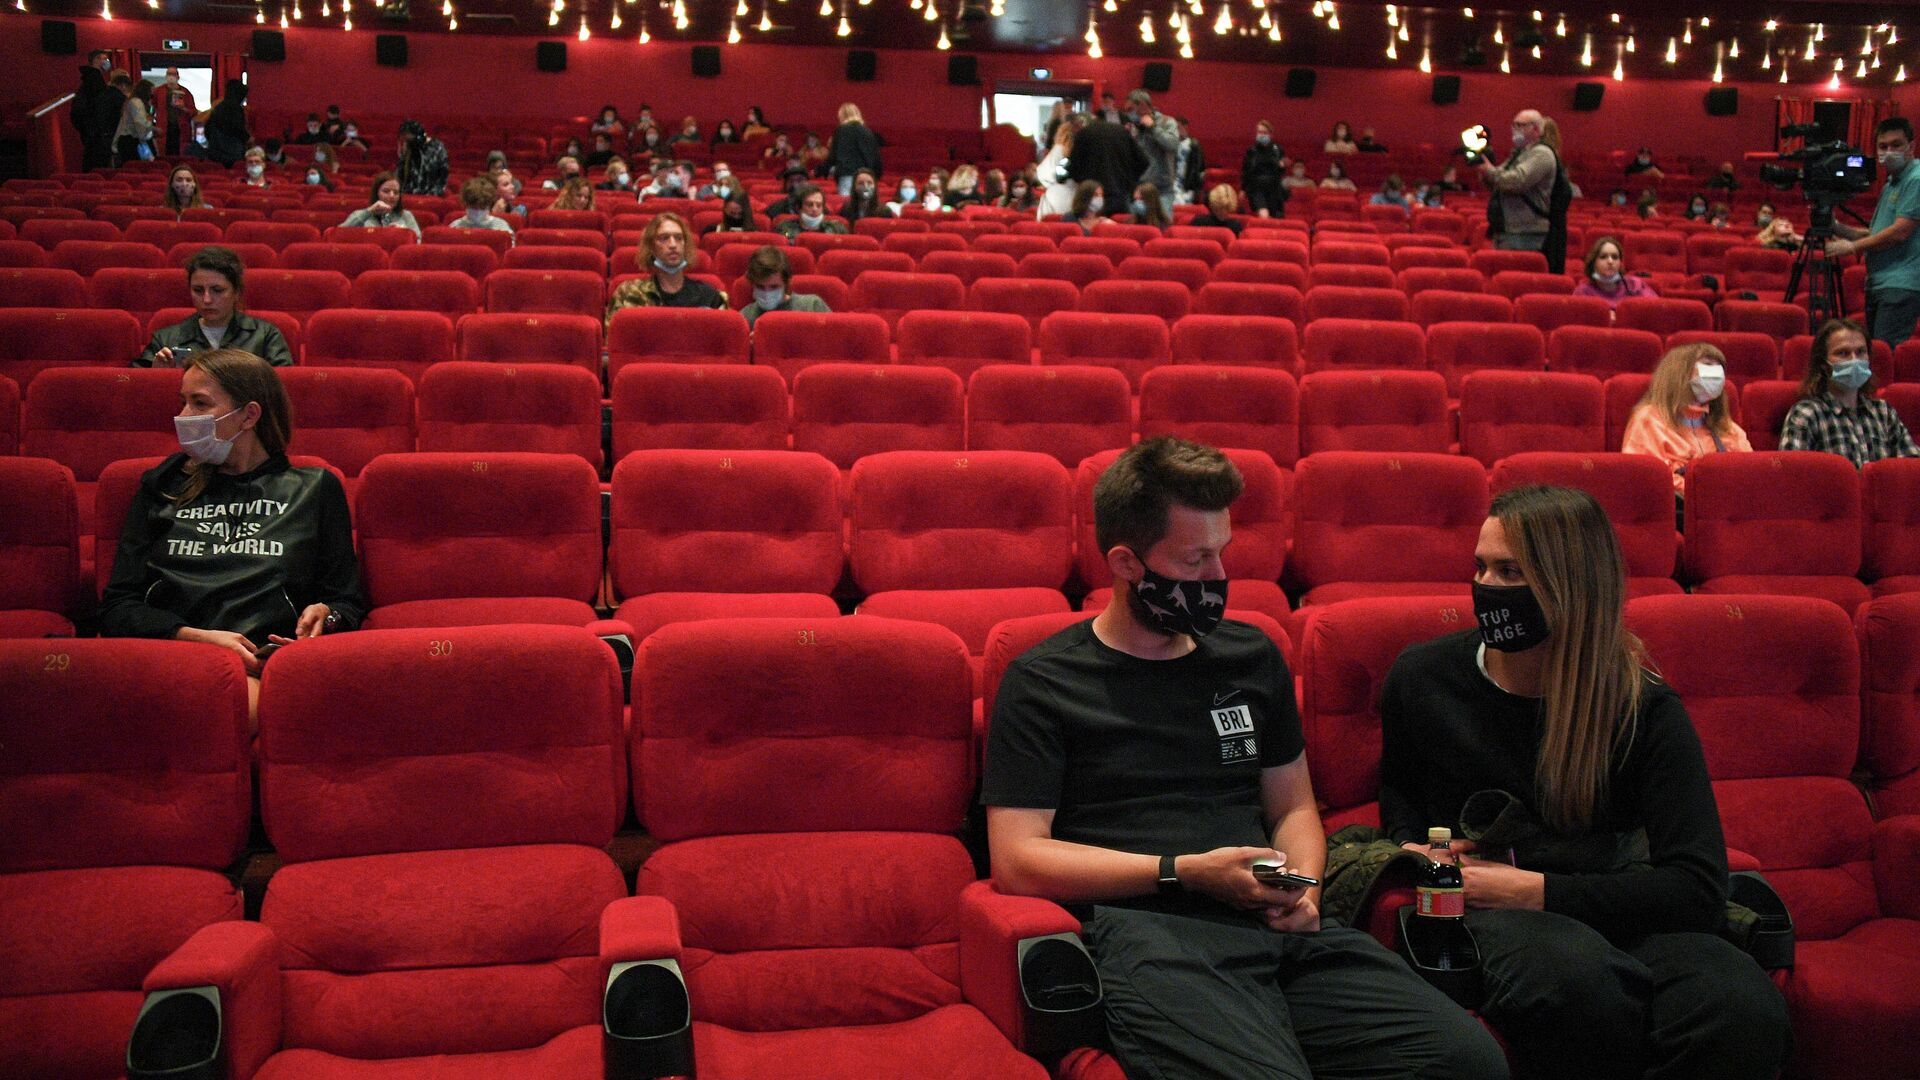 1575290343 0:211:3072:1939 1920x0 80 0 0 d363a7ddc294b47d360f87f07741cda1 - В России запретят закрывать на ключ двери в кинотеатрах во время сеансов